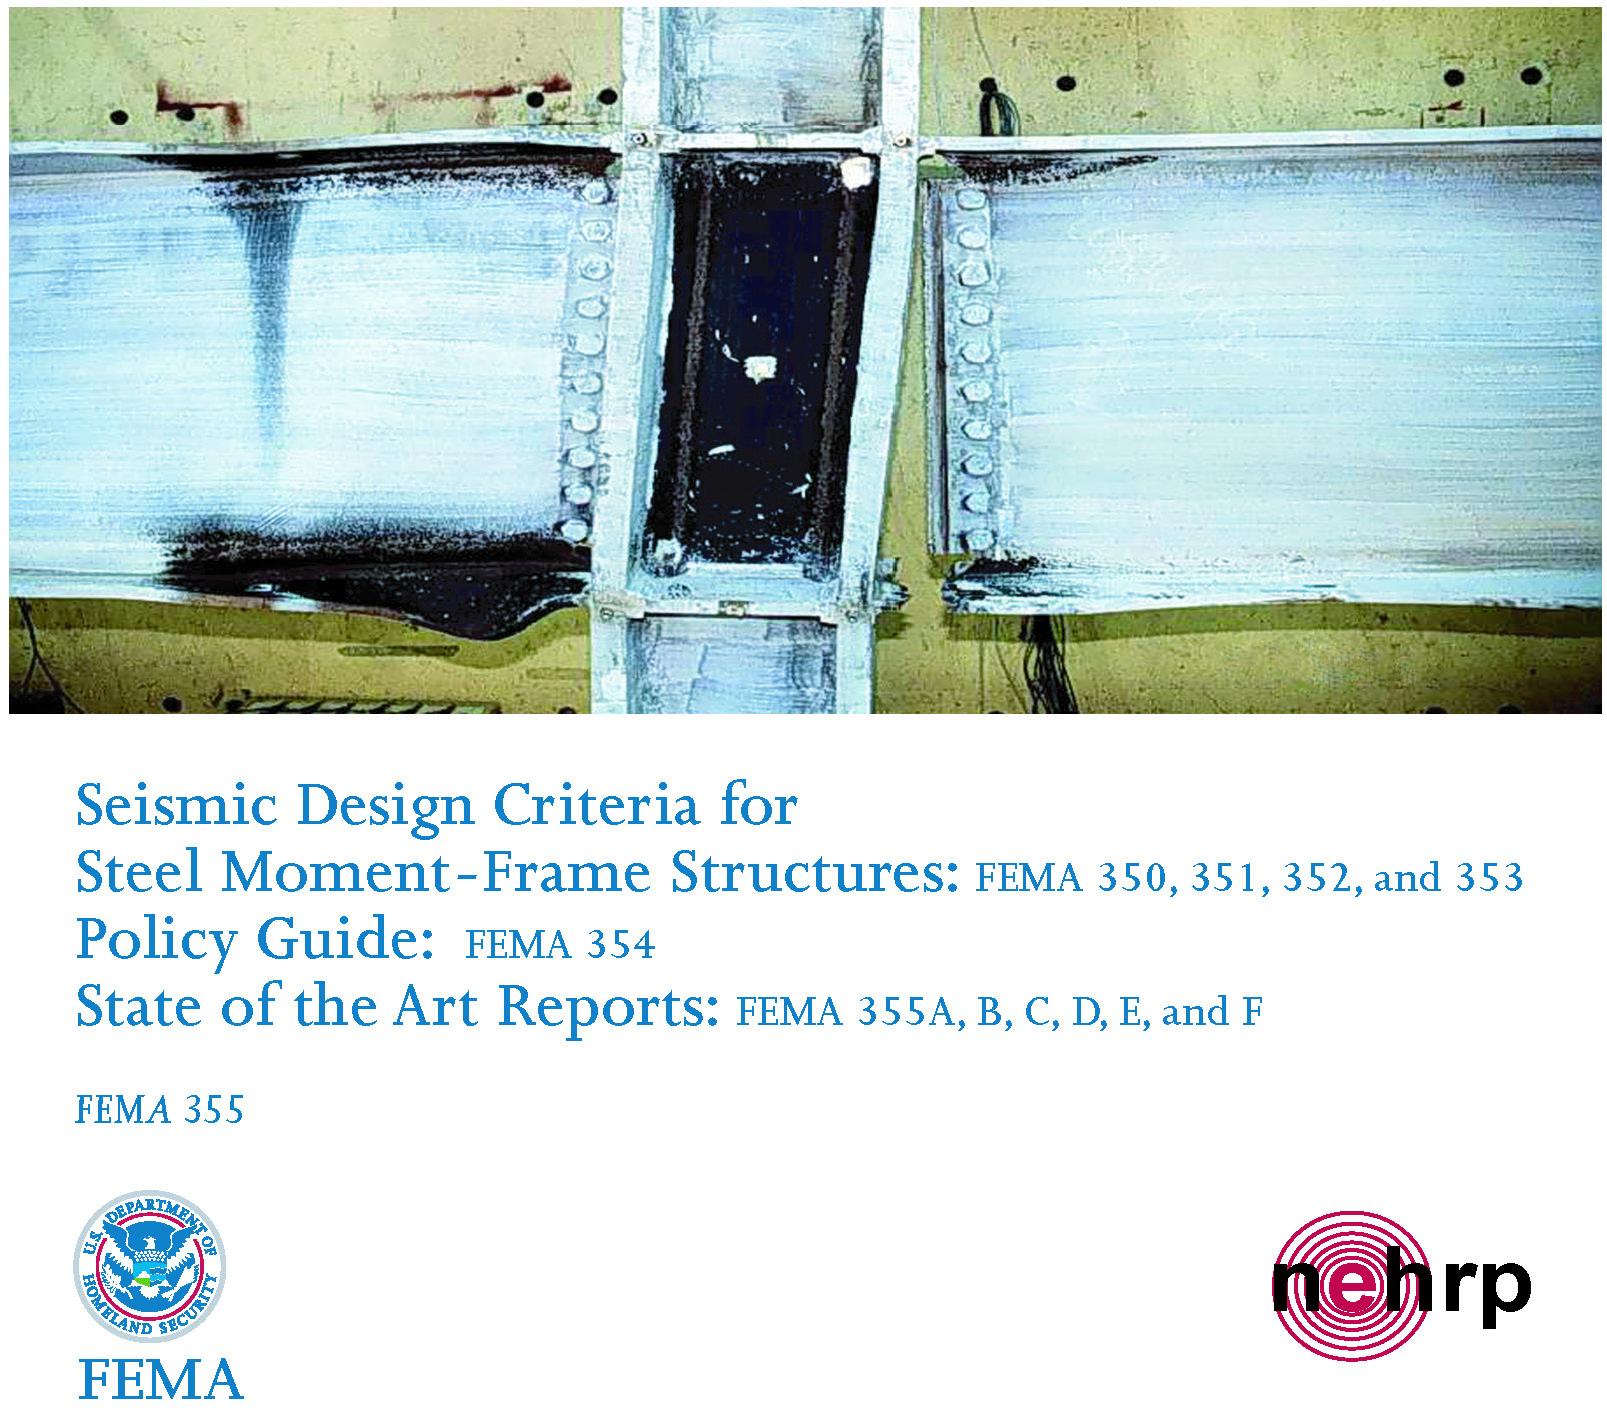 Publications :: Seismic Design Criteria for Steel Moment-Frame ...